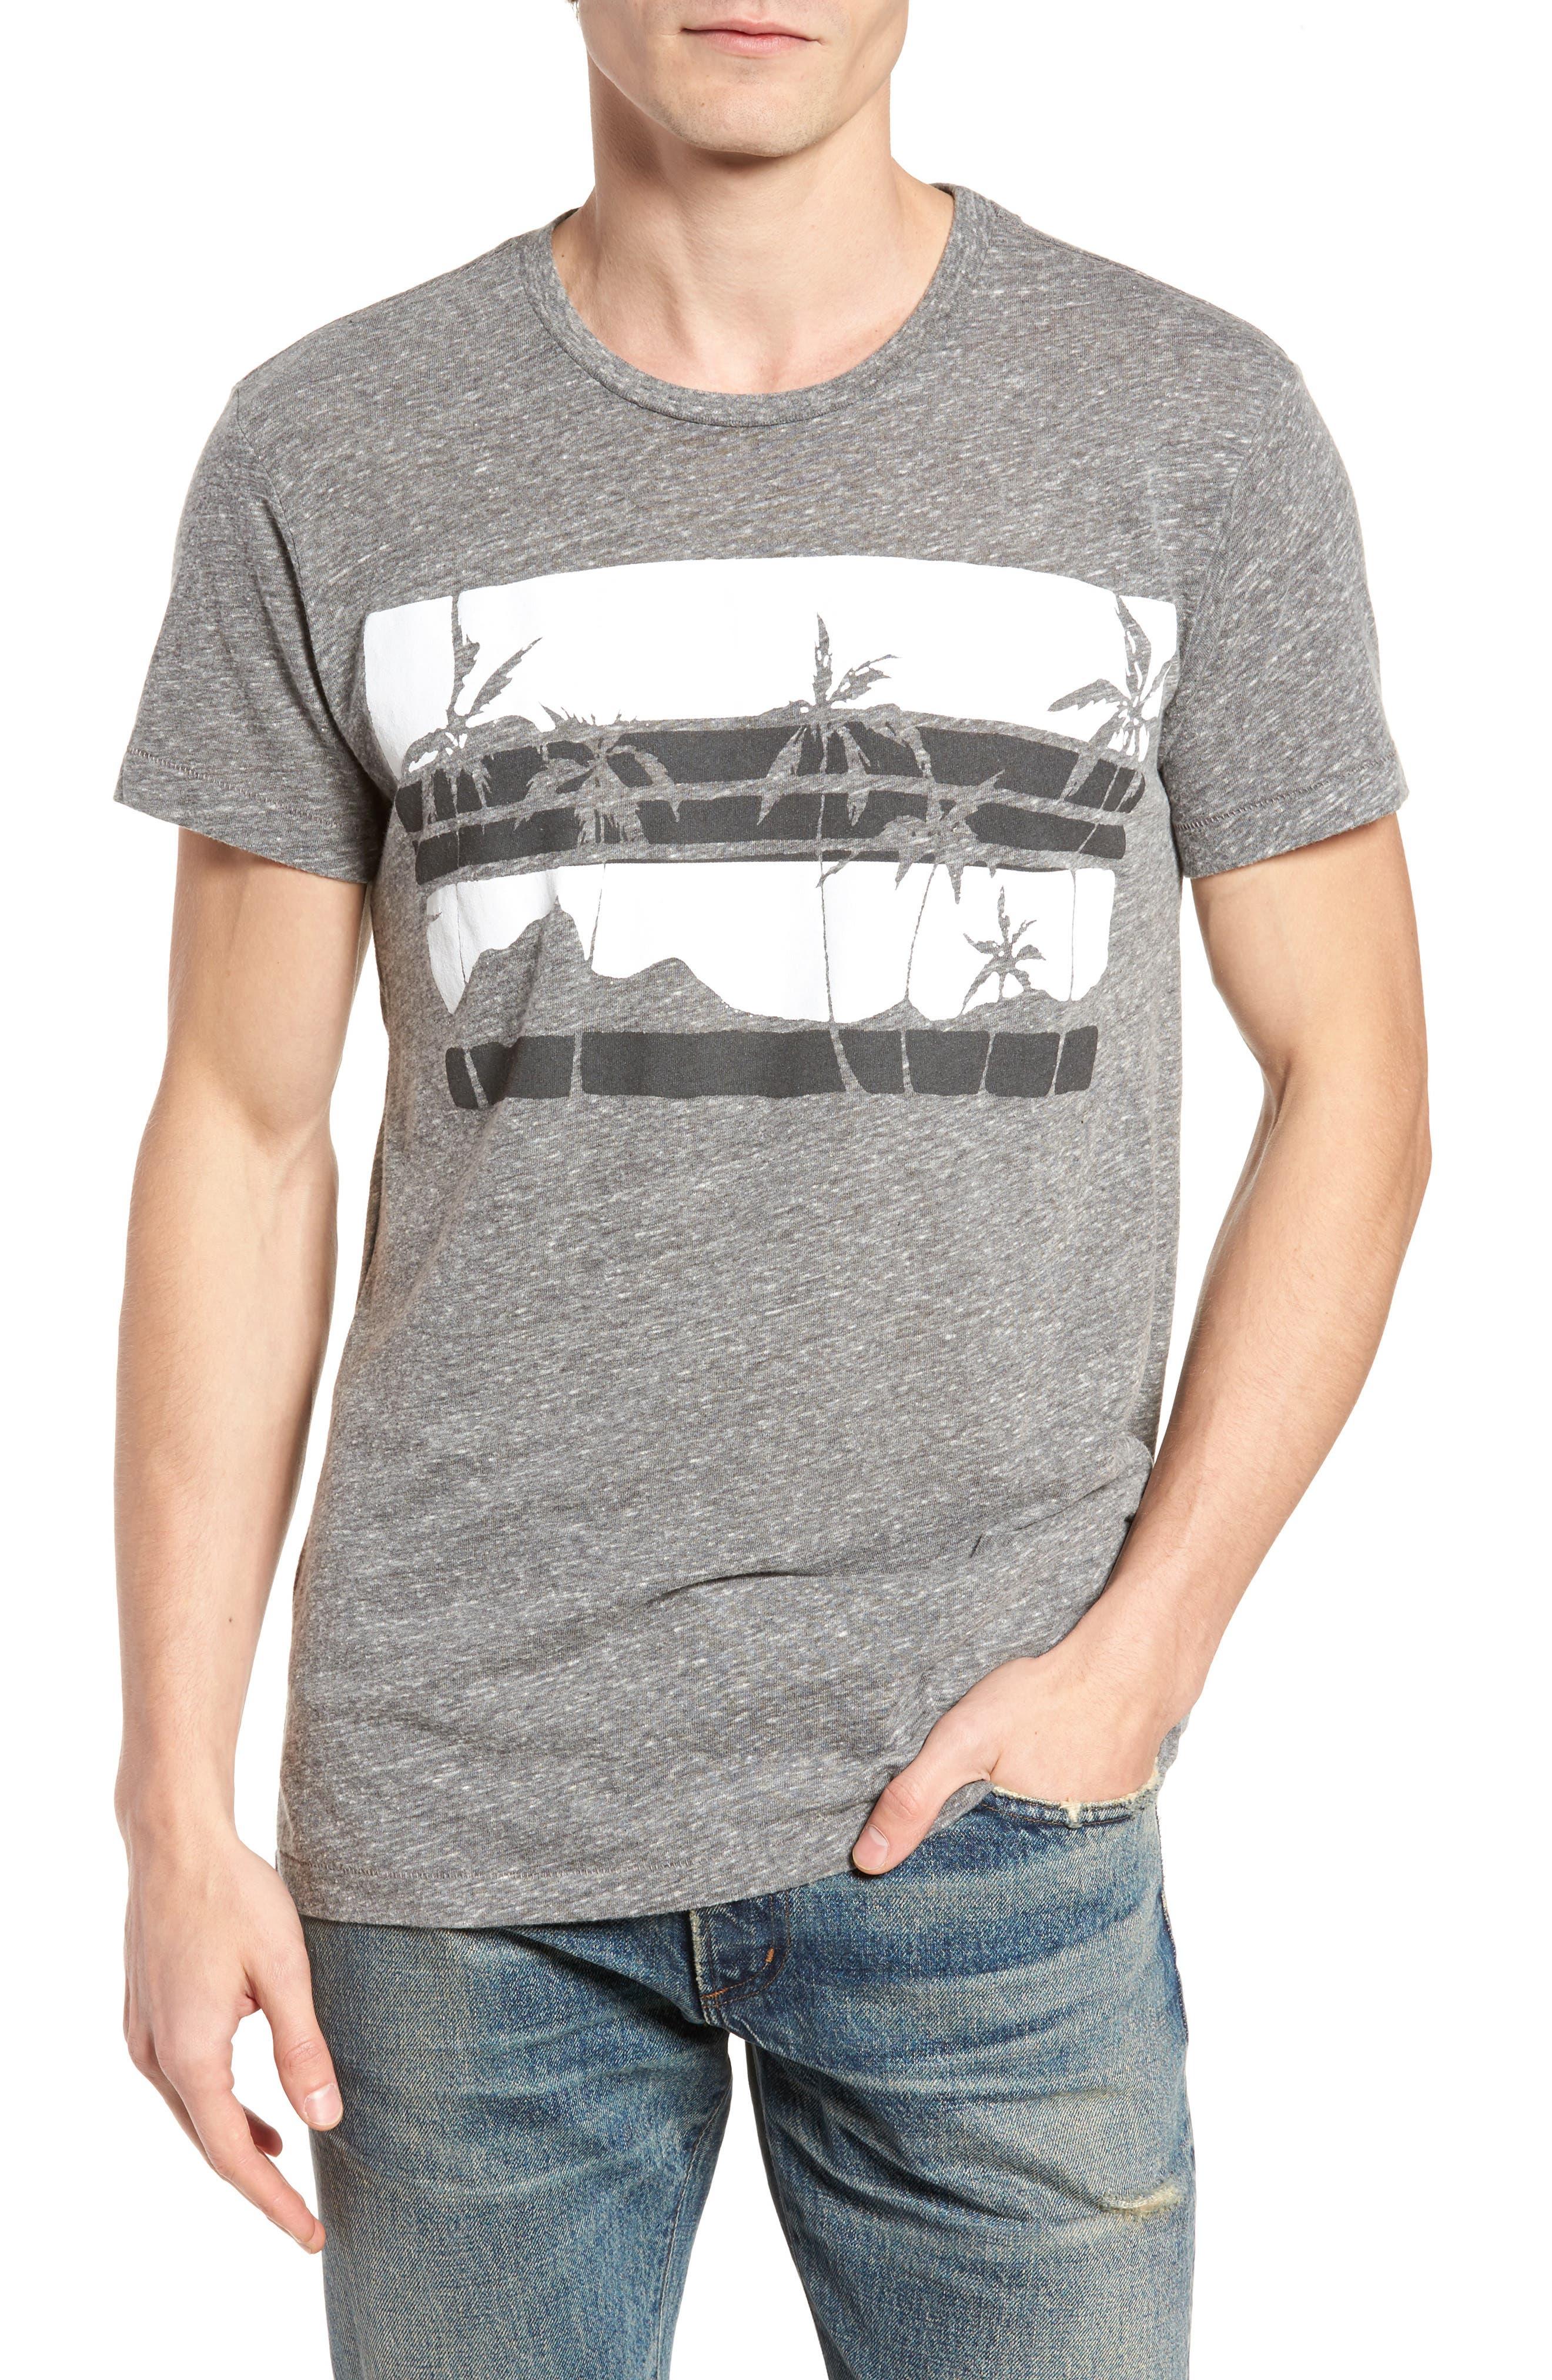 Las Palmas T-Shirt,                         Main,                         color, Heather Grey